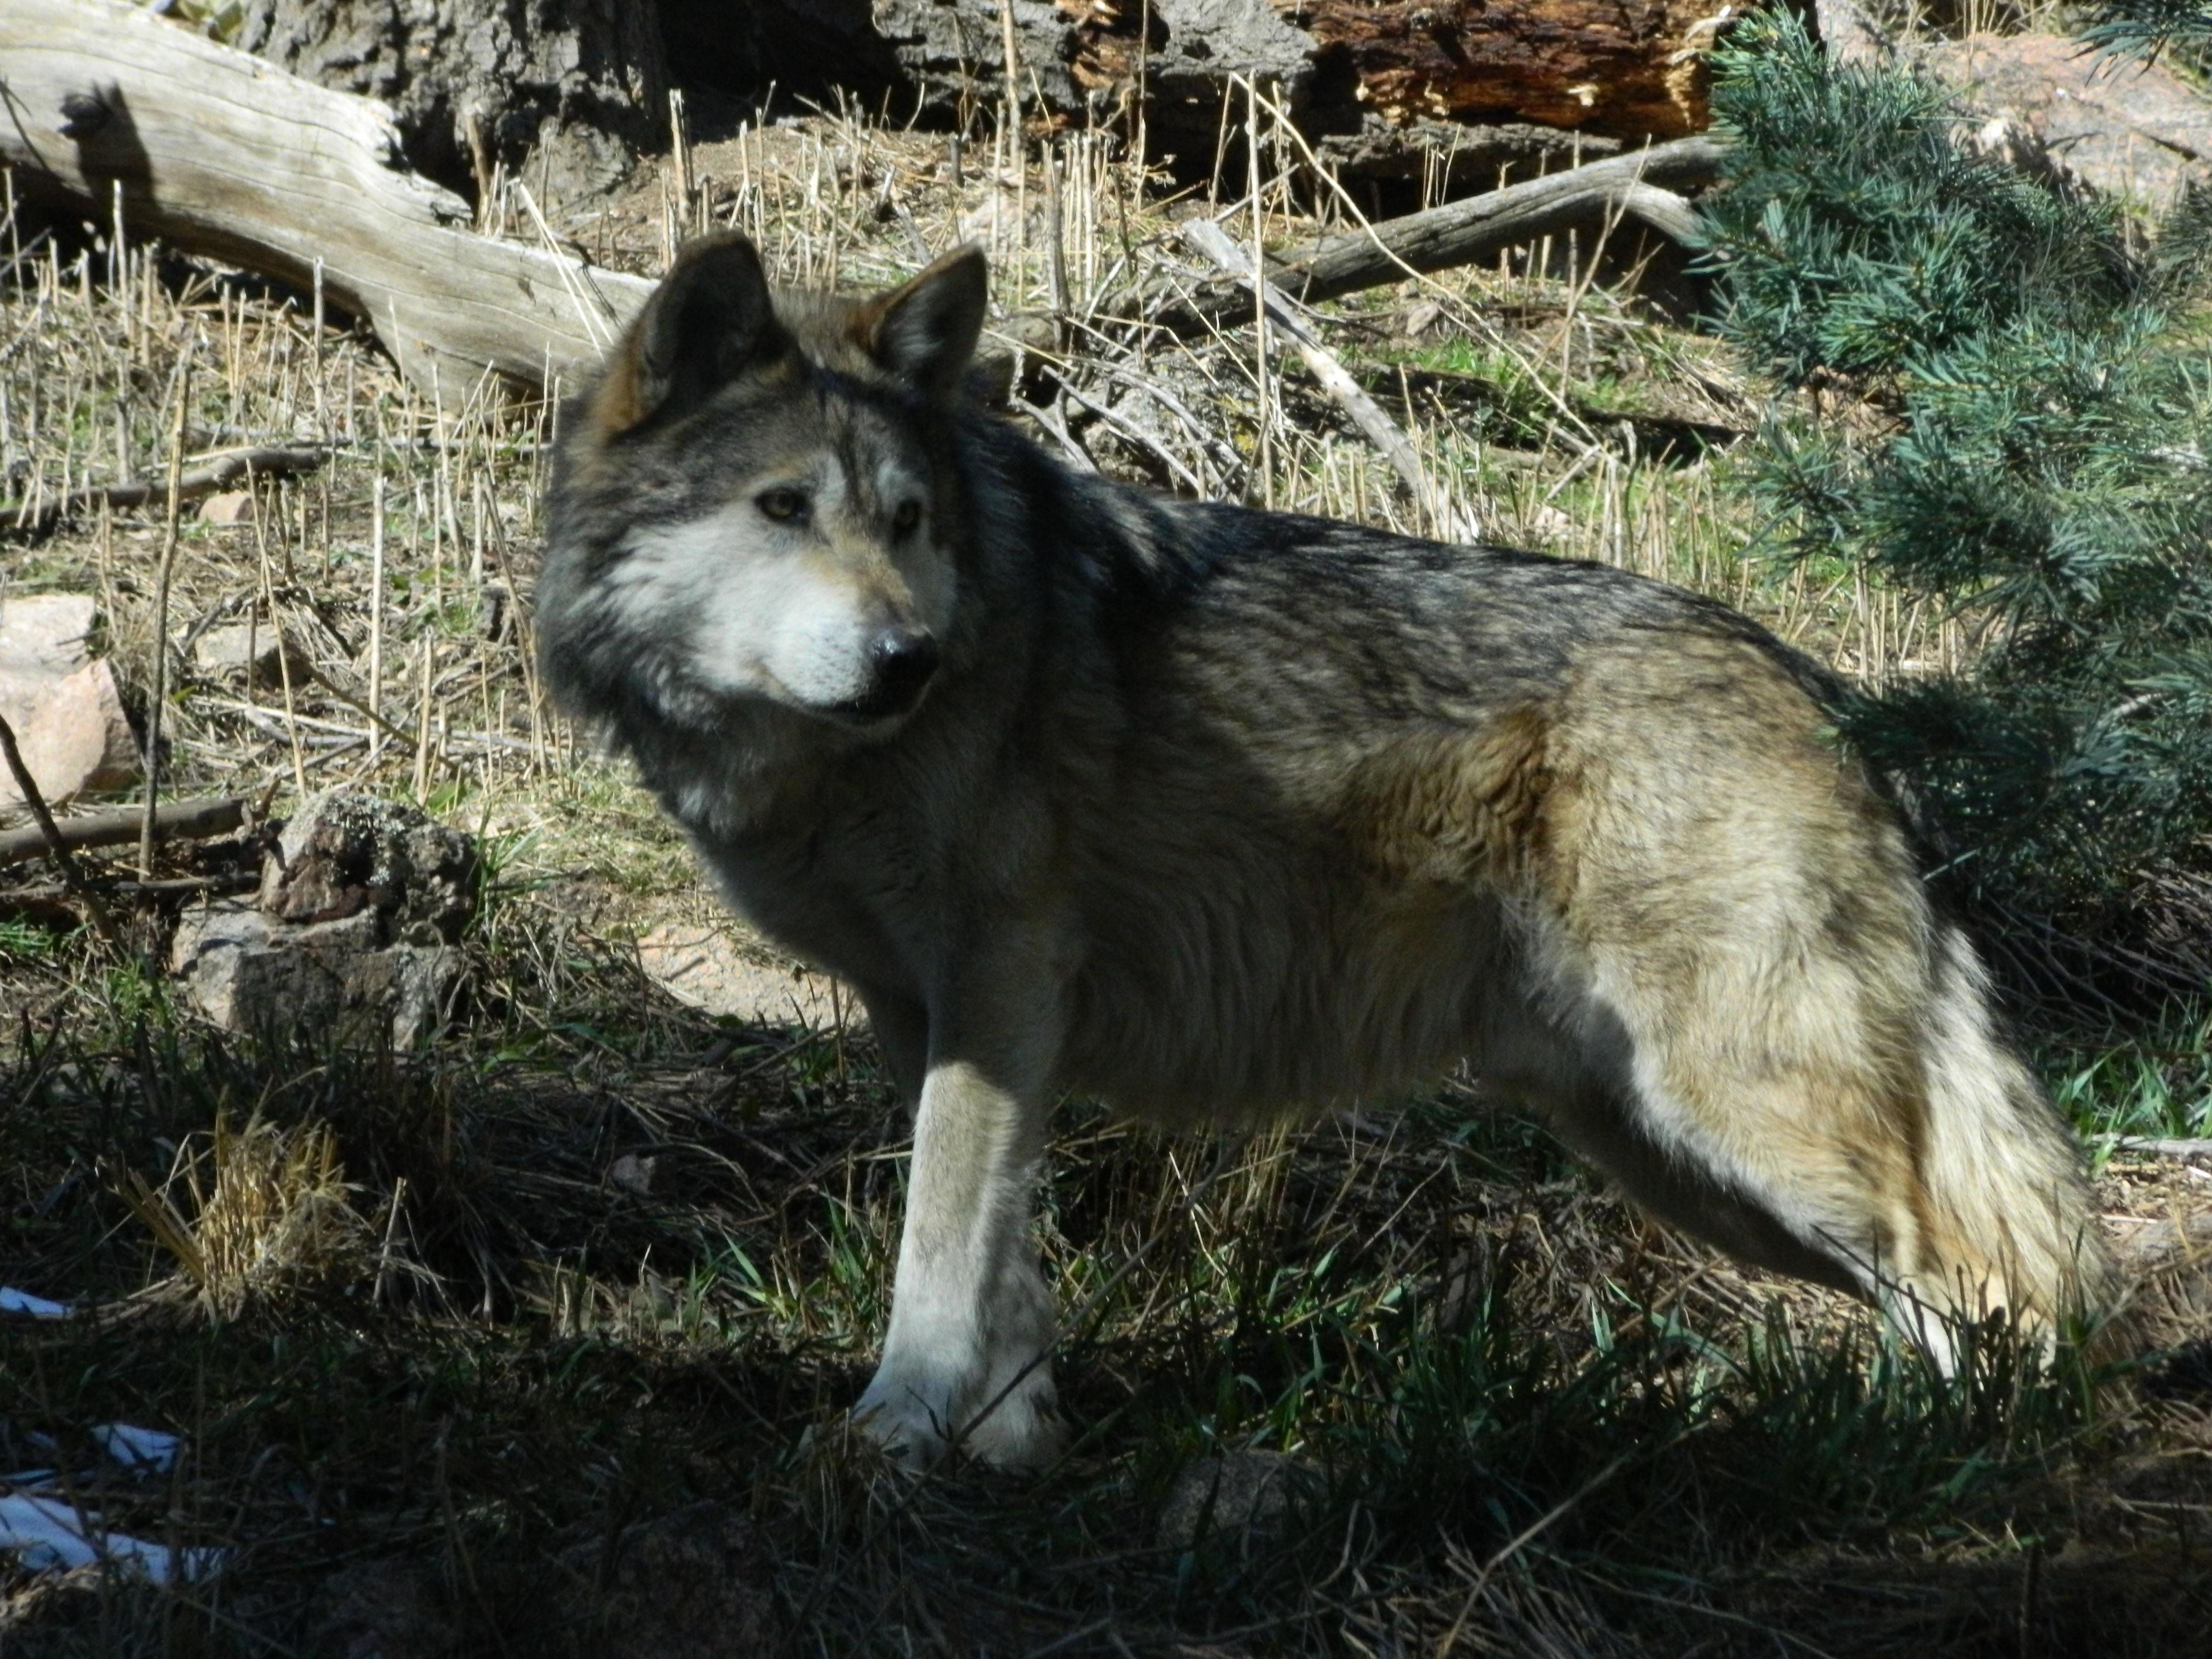 Cheyenne mountain zoo